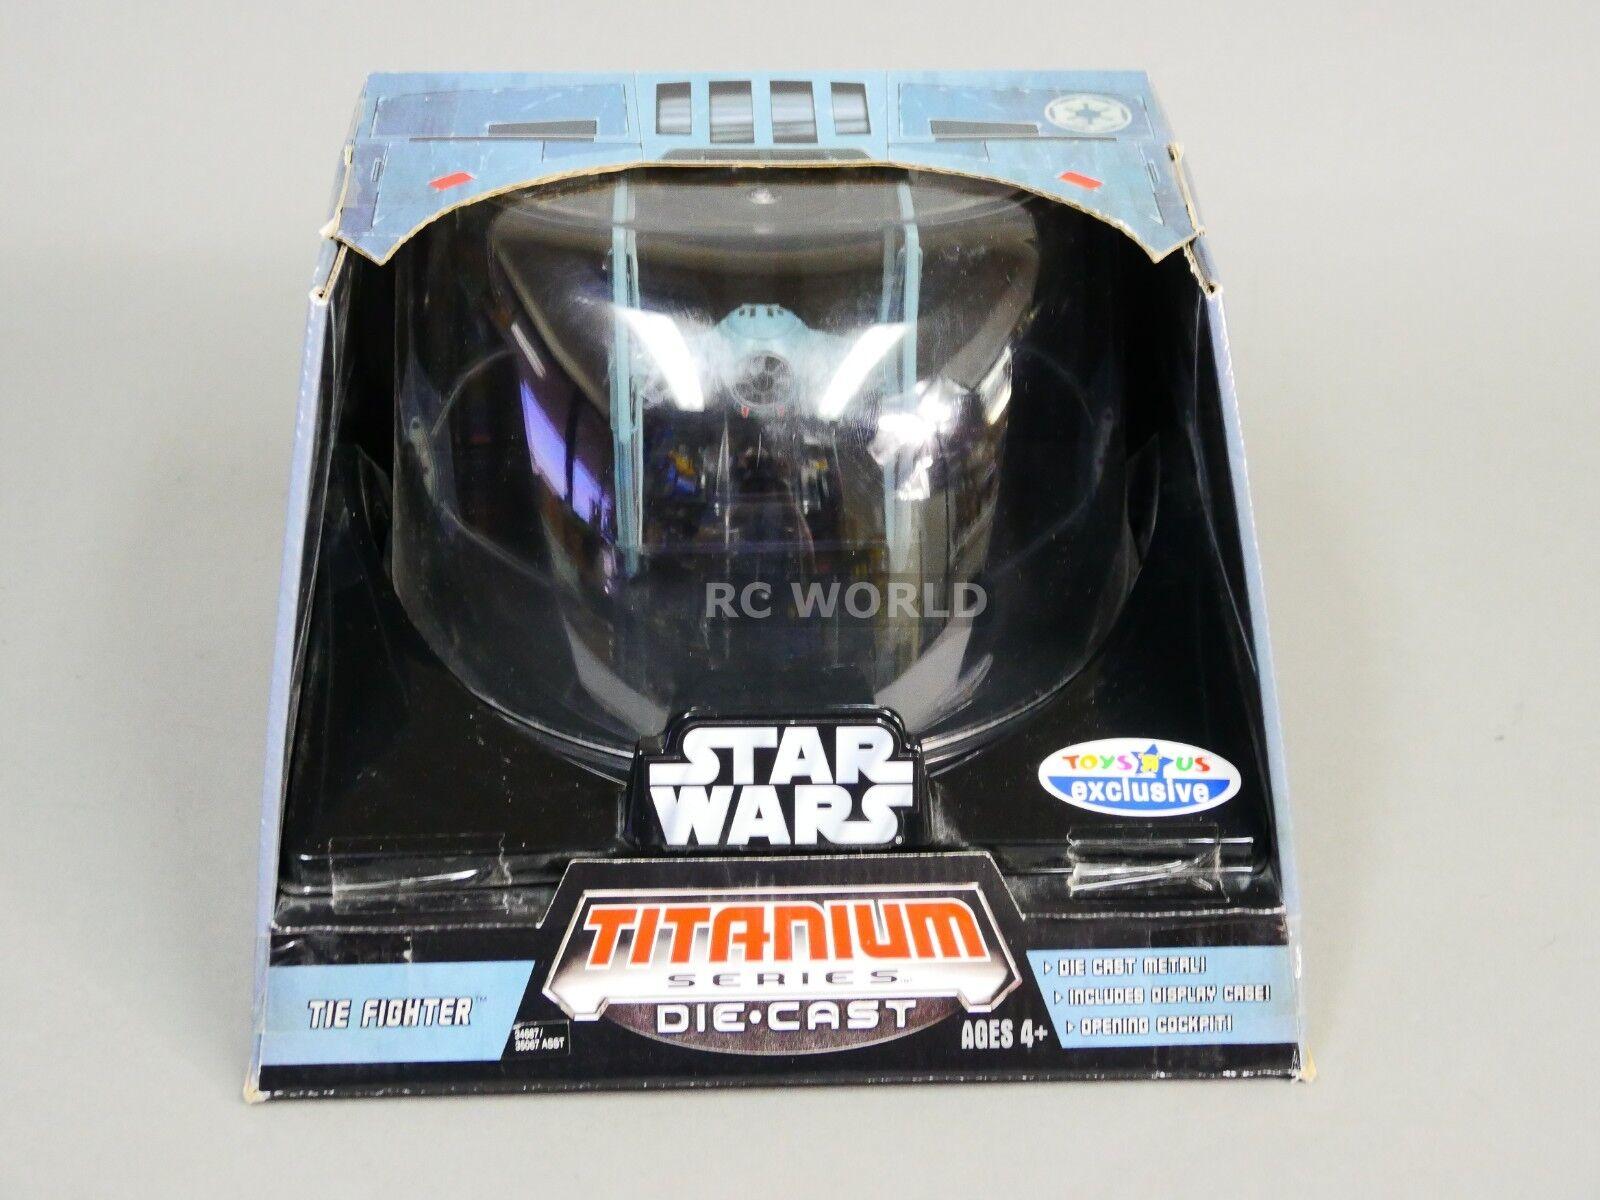 Star - wars - reihe krawatte kämpfer druckguss modell   ob1